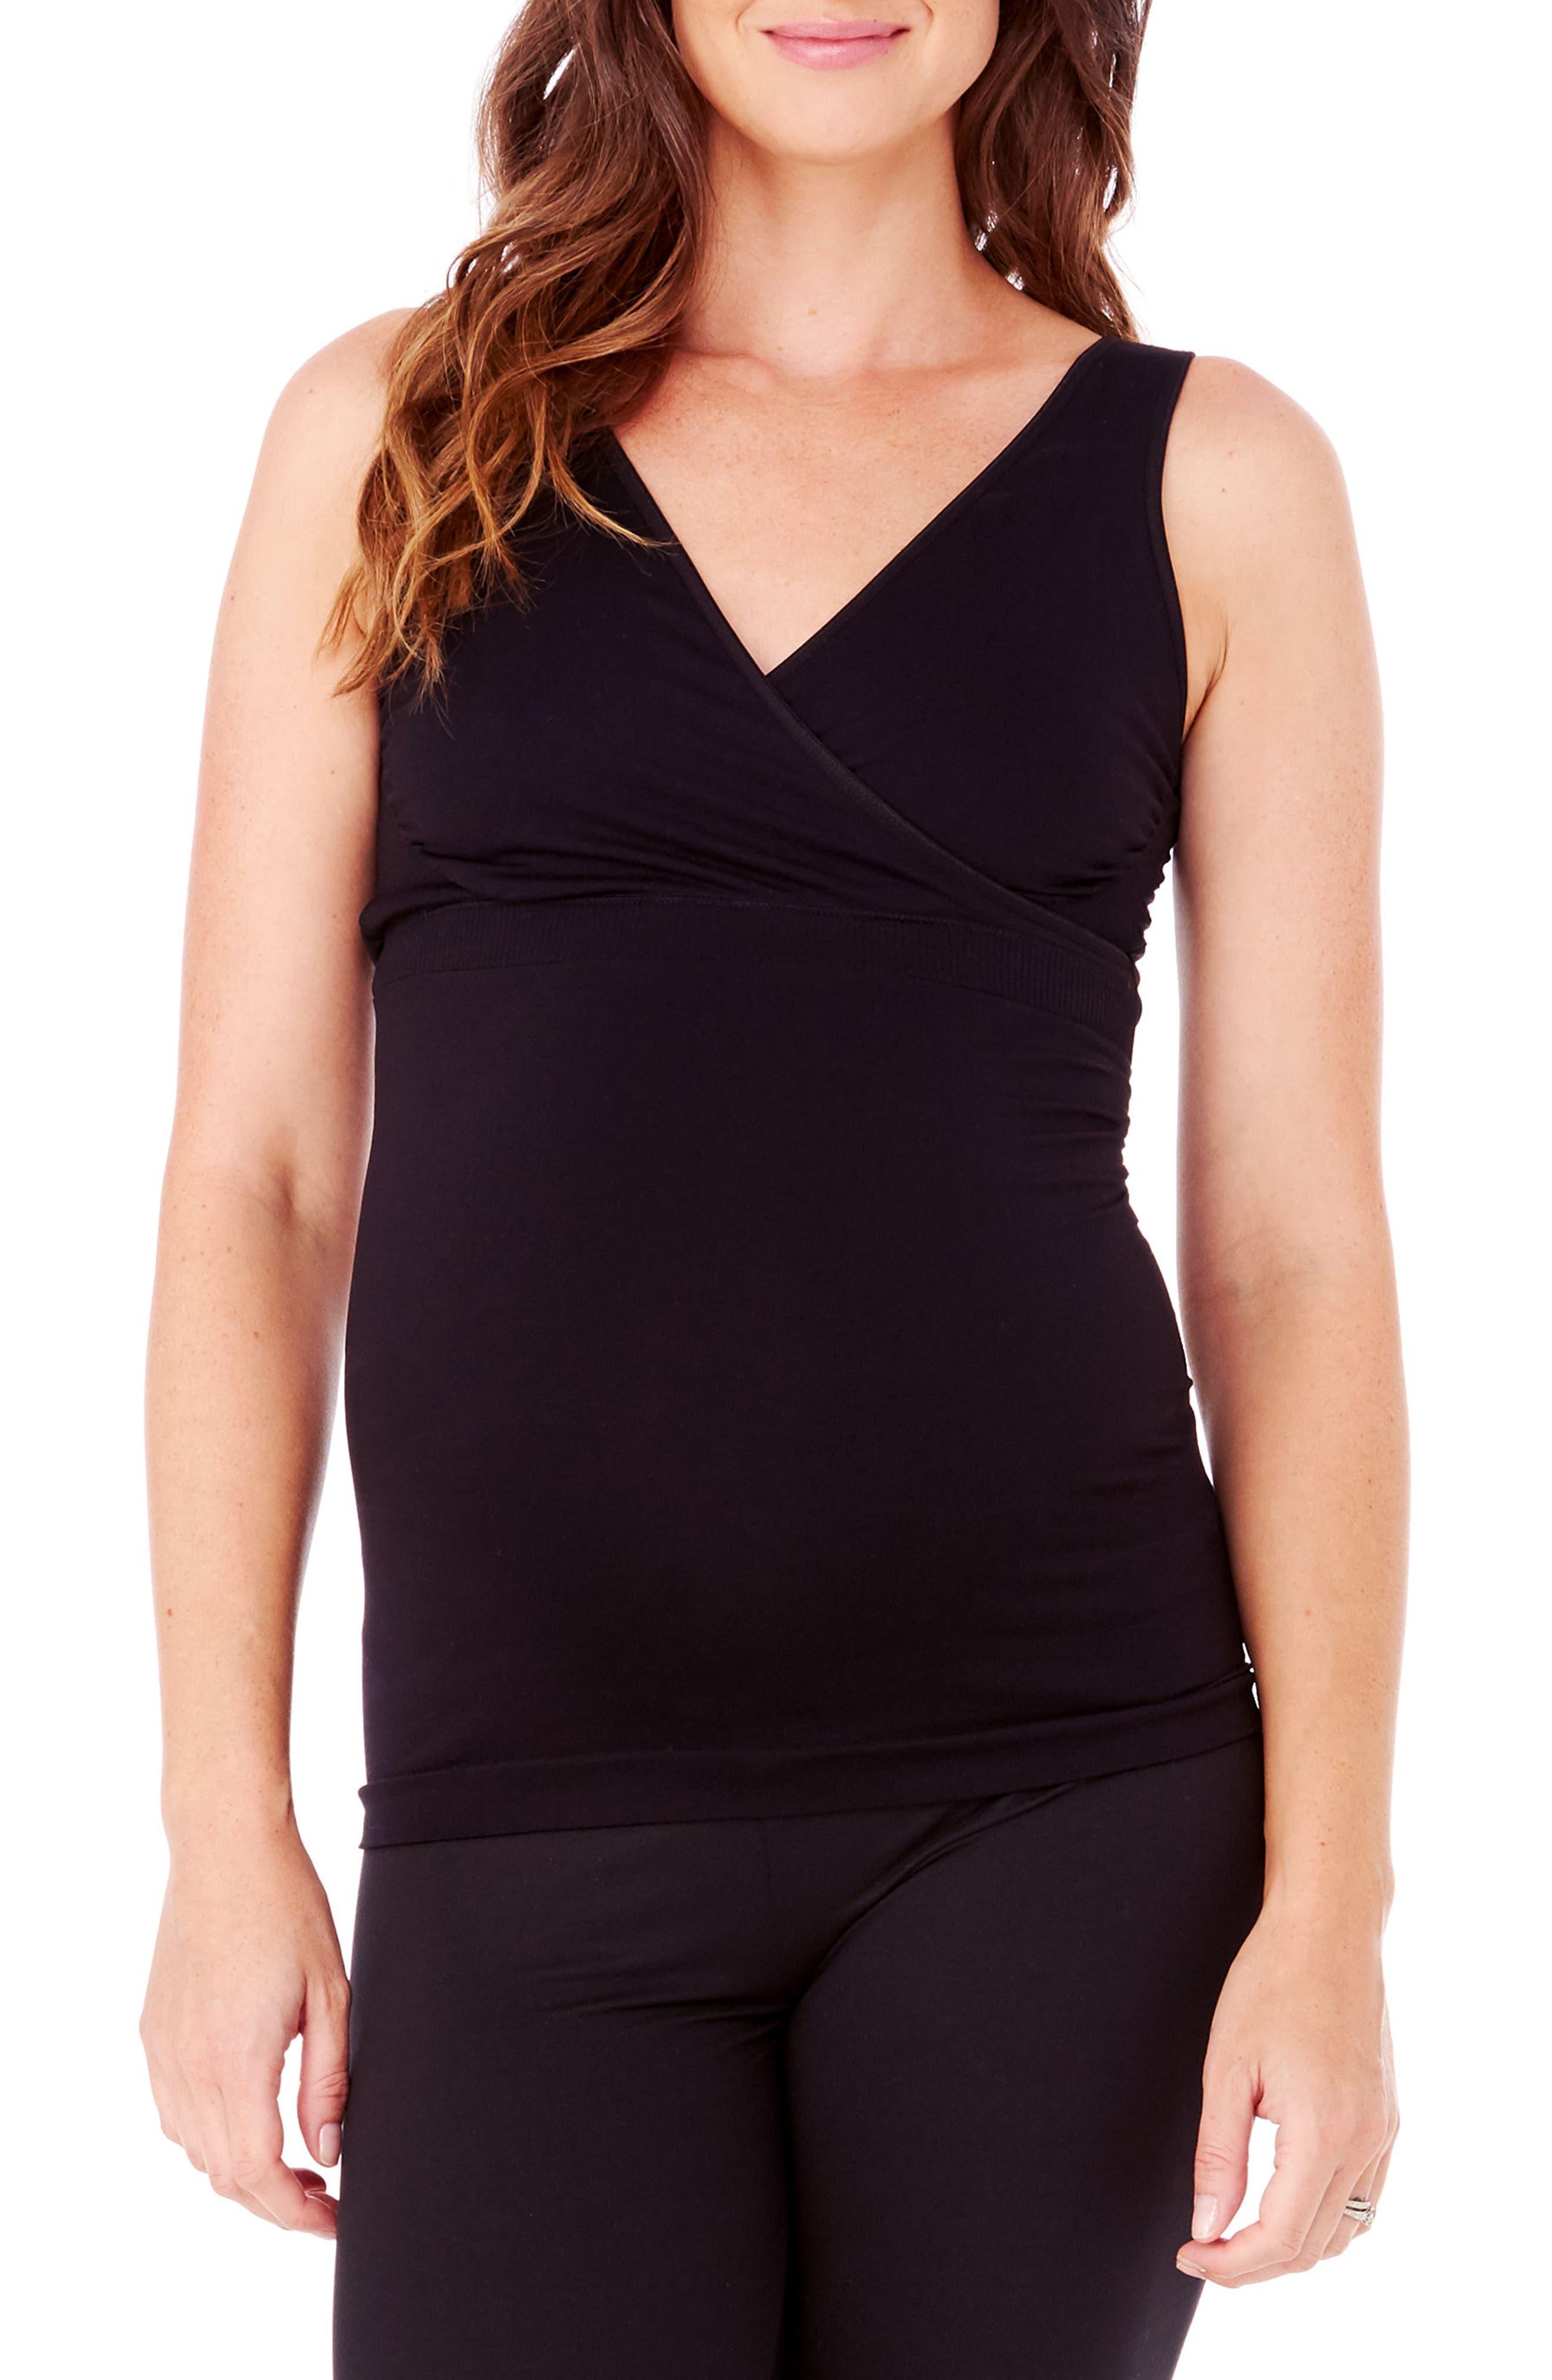 Main Image - Ingrid & Isabel® Crossover Maternity/Nursing Tank